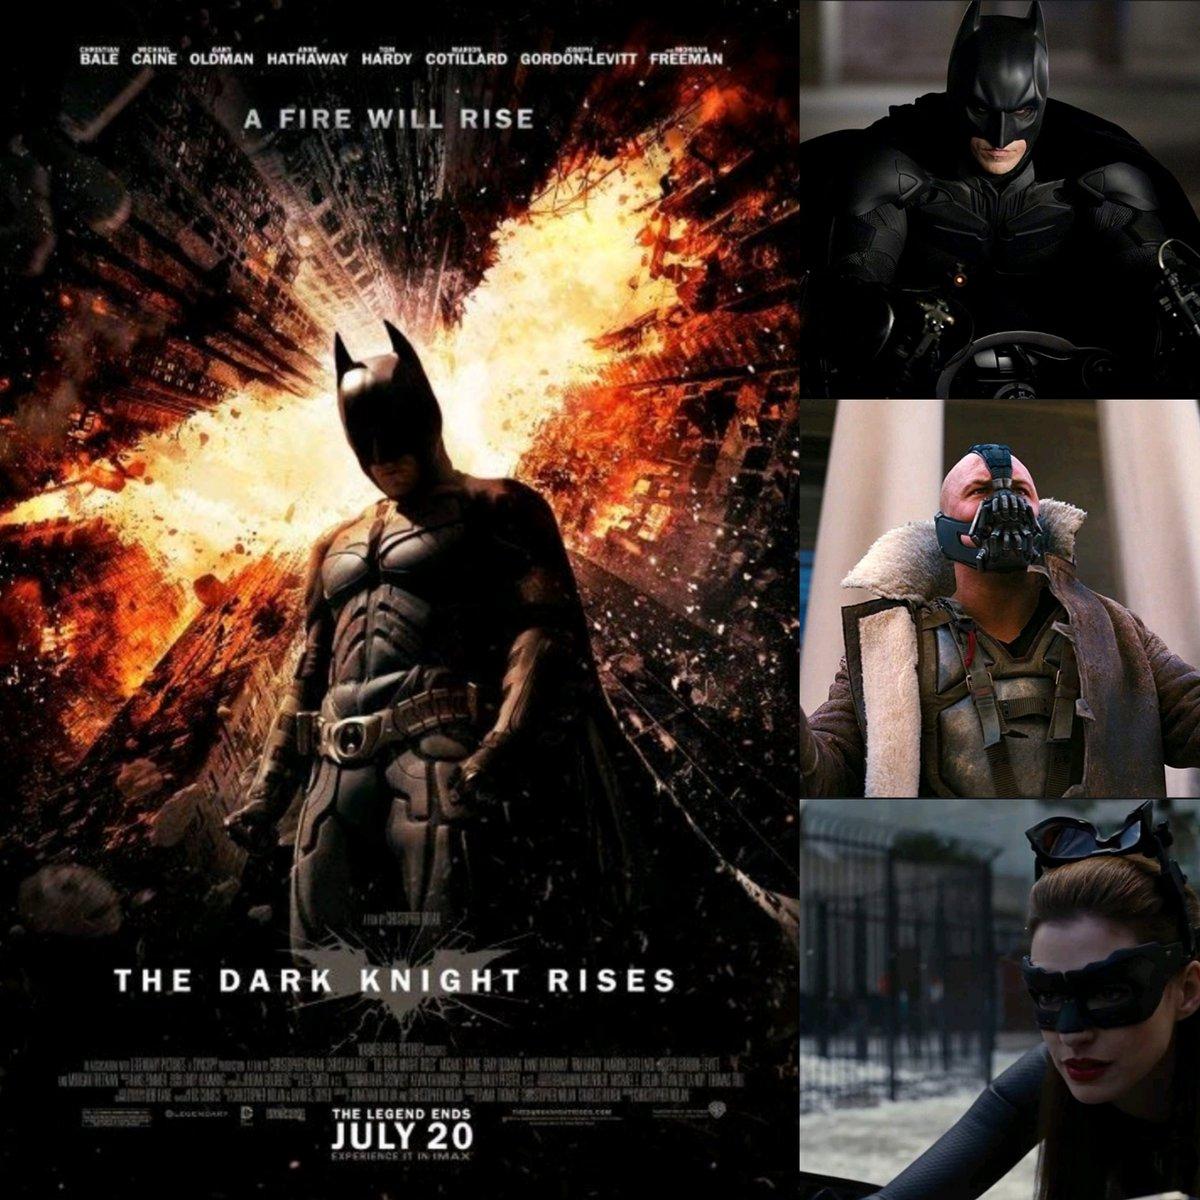 Promote DC Movies - The Dark Knight Rises. I would like to take you back to the year 2012 when #thedarkknightrises arrived at the cinema. #christianbale #Batman #michaelcaine #garyoldman #tomhardy #annehathaway #josephgordonlevitt #marioncotillard #morganfreeman #dccomicspic.twitter.com/gJKsqLE6JV